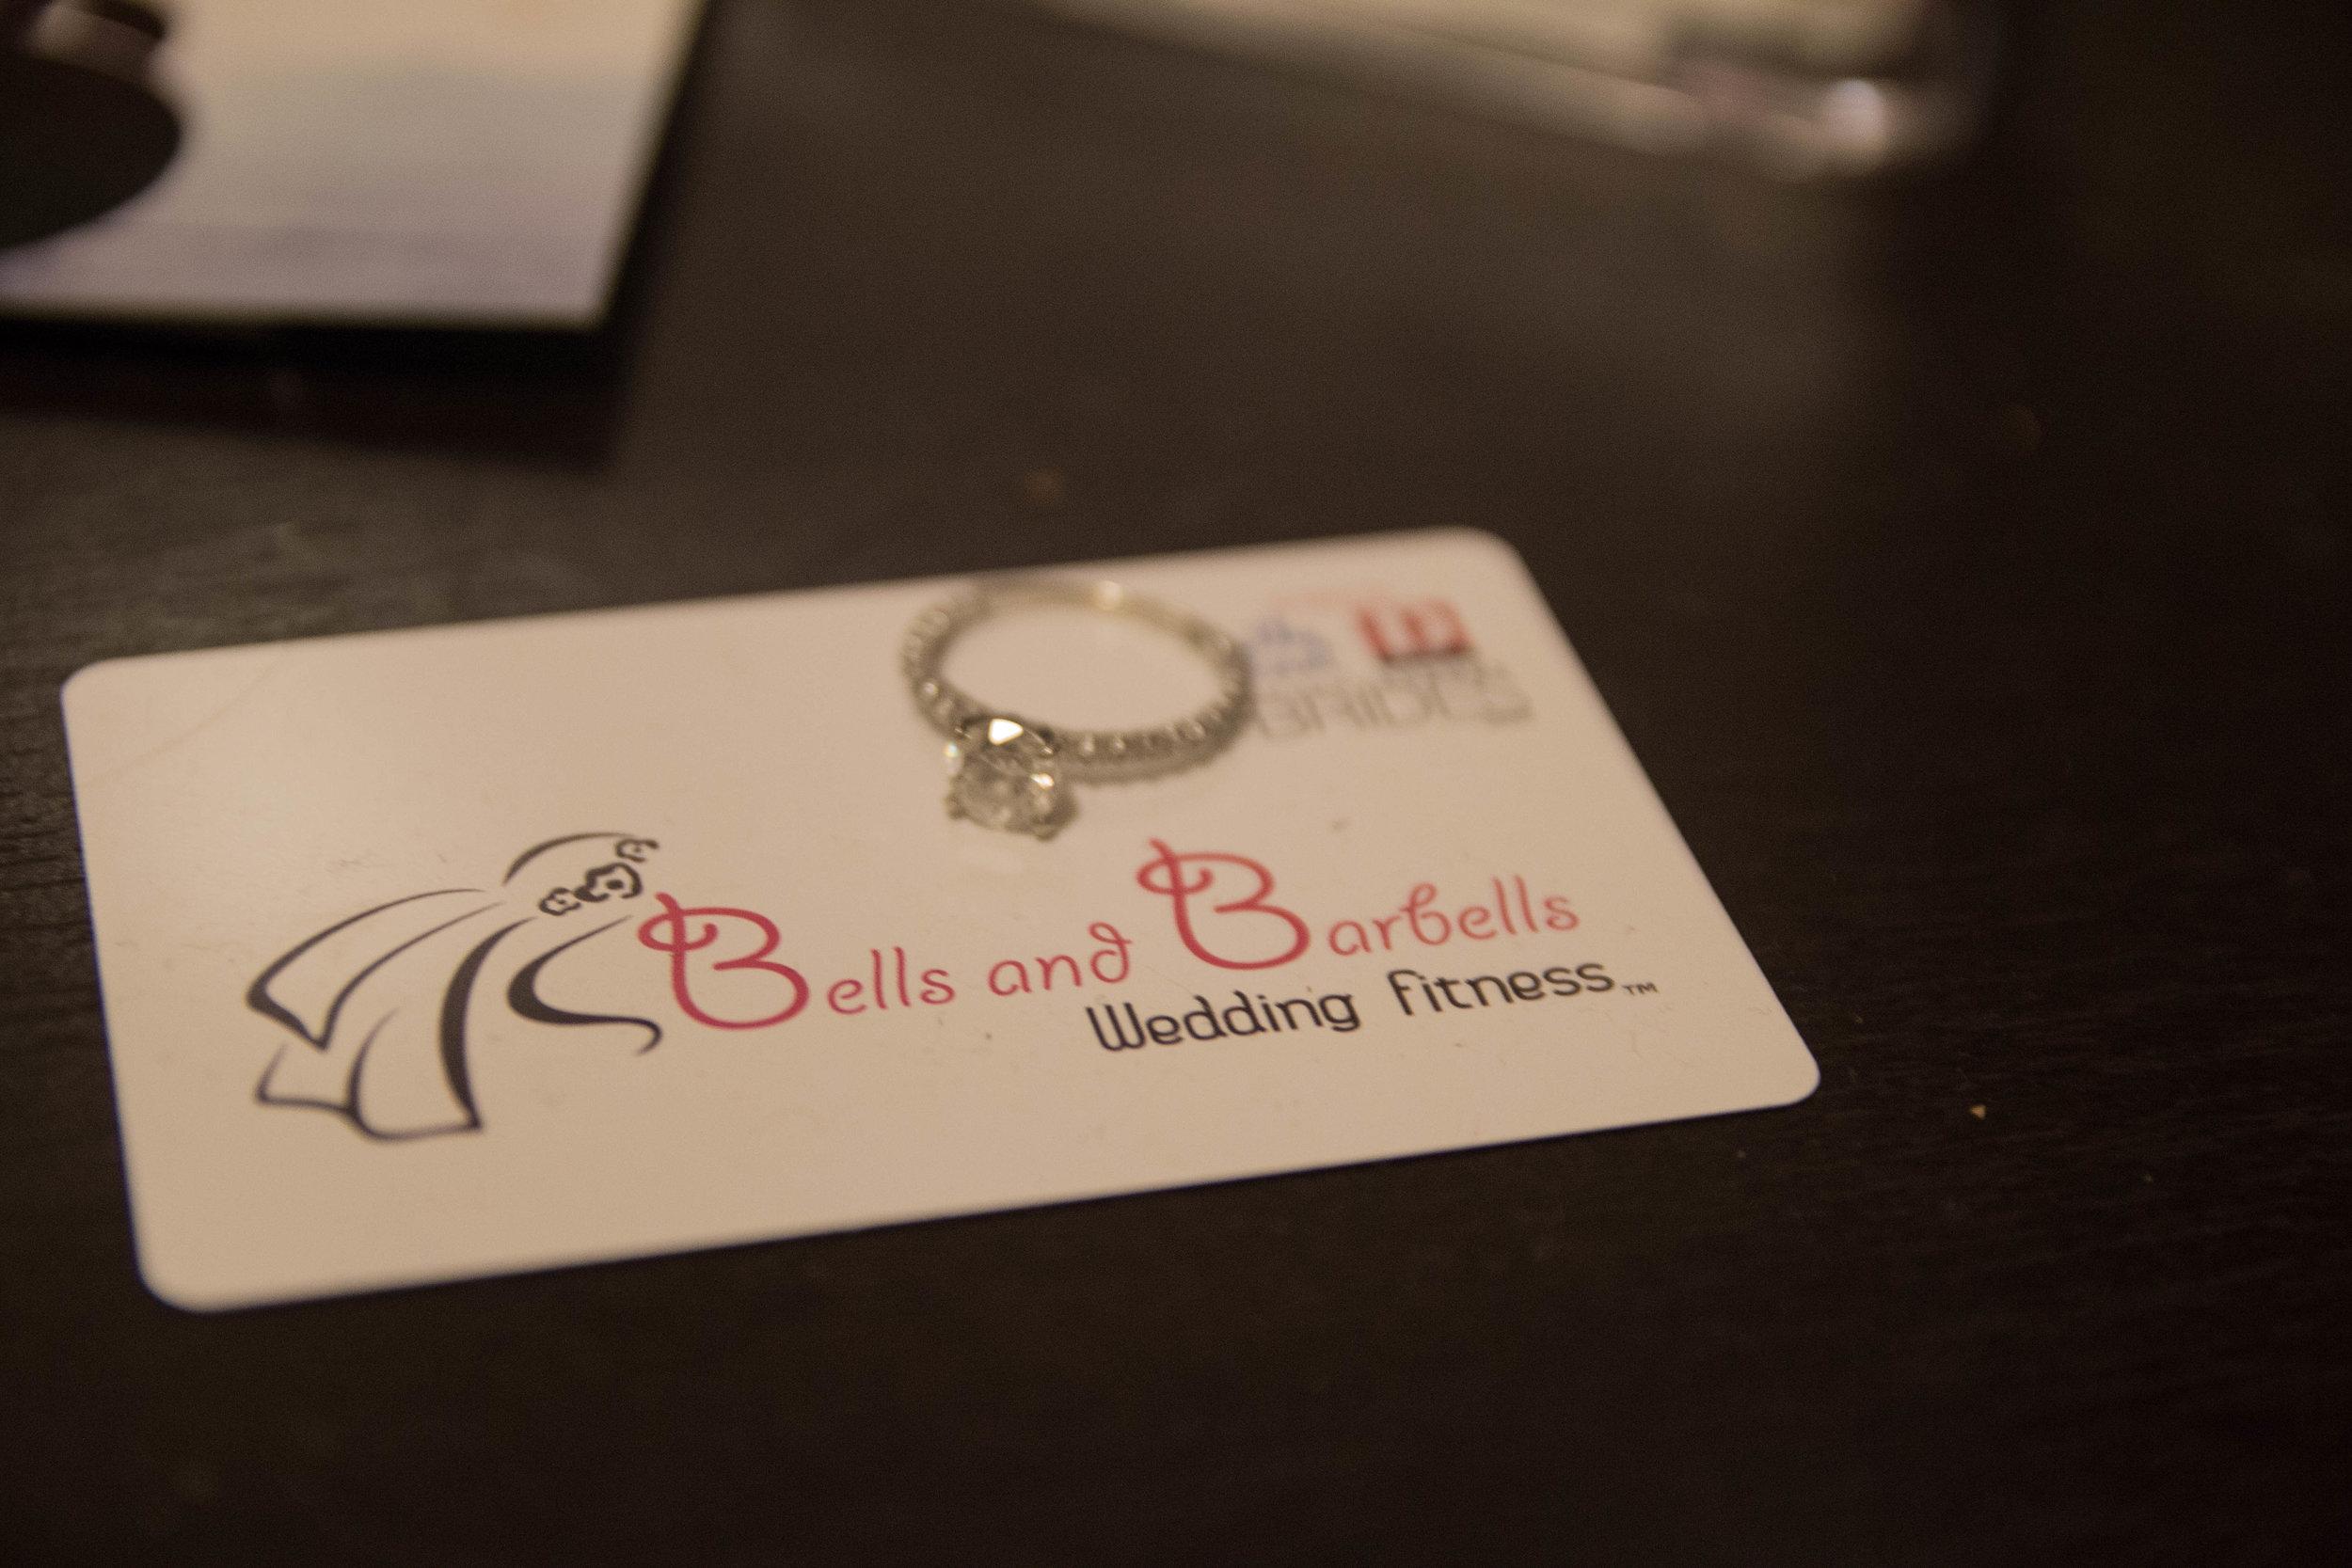 wedding fitness, bells and barbells, pre wedding workouts, katherine bahlberg, engaged, dallas, dallas bride, dallas wedding